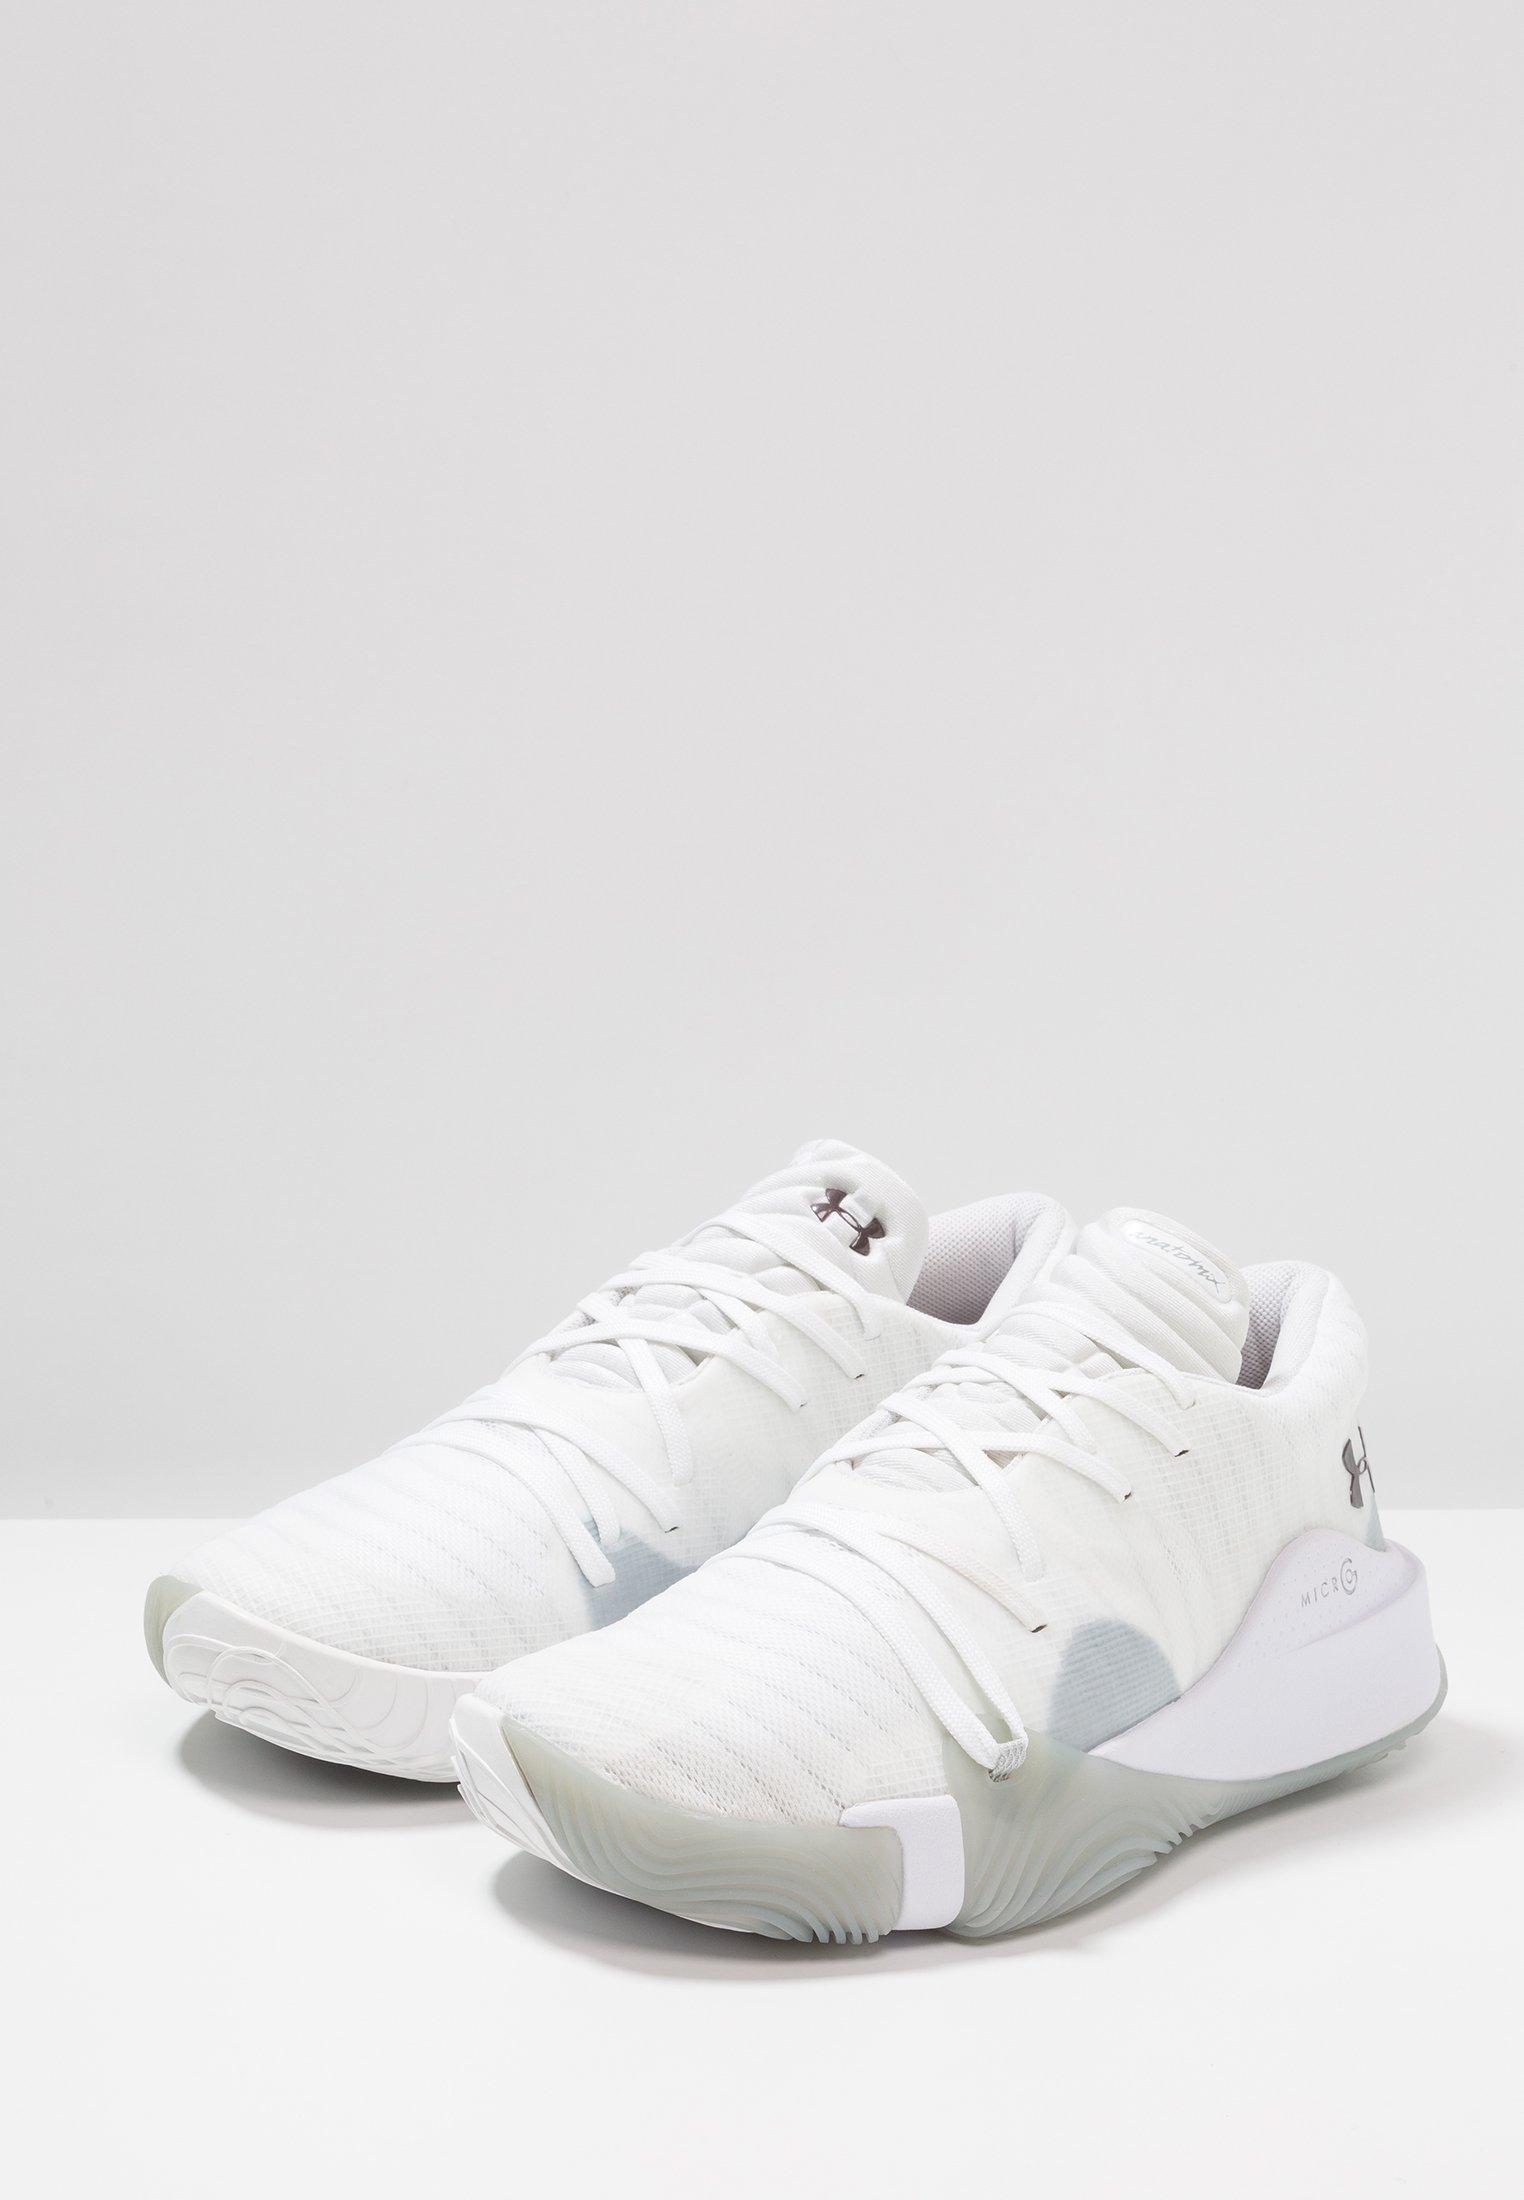 SPAWN LOW Chaussures de basket whiteash taupe